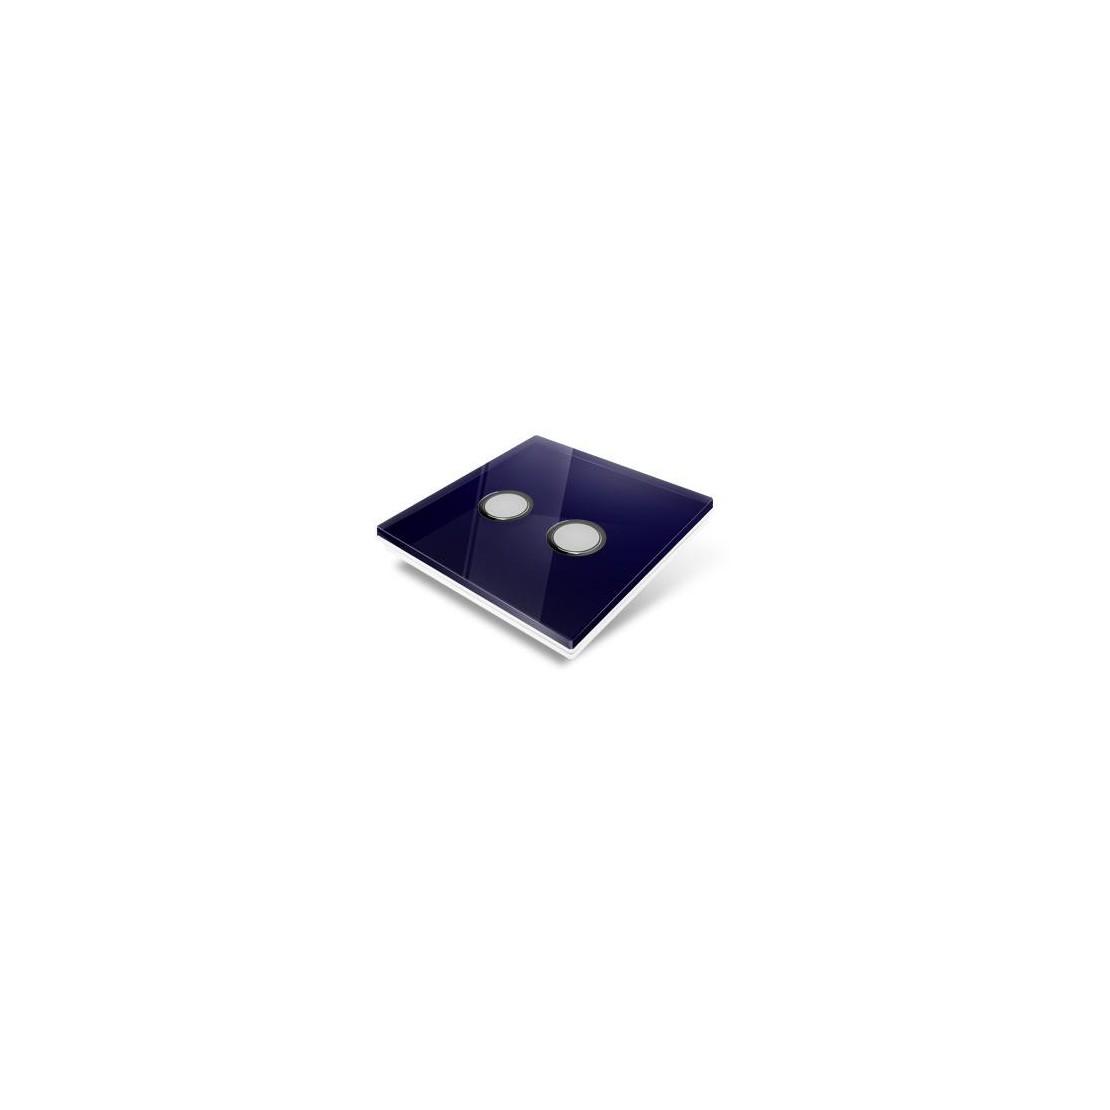 Cubierta para interruptor Edisio - crystal azul claro